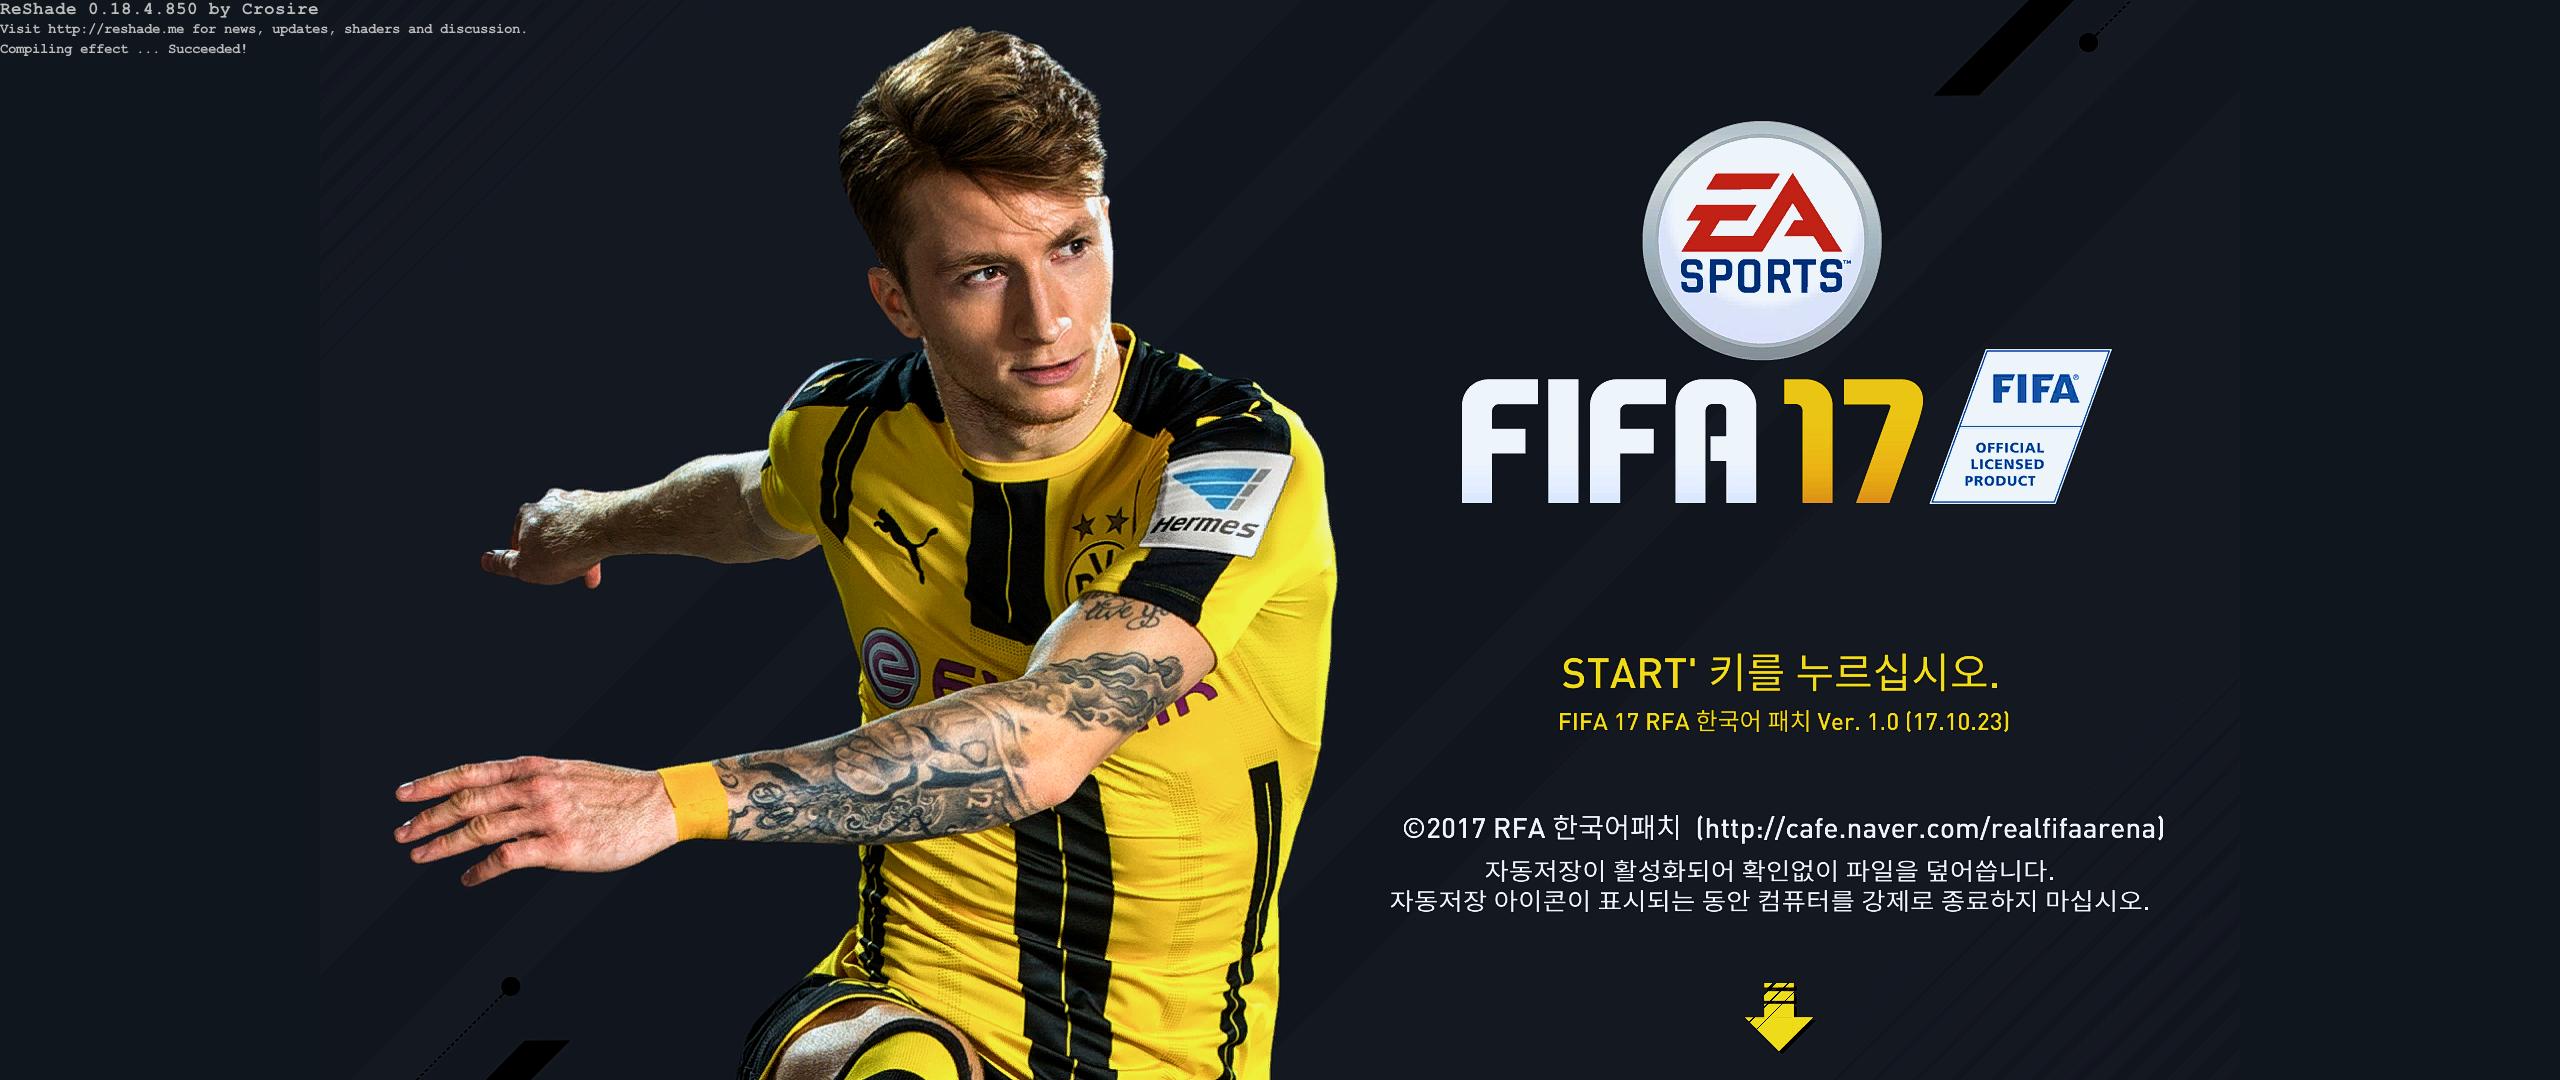 FIFA 17 Screenshot 2017.11.10 - 18.30.05.40.png